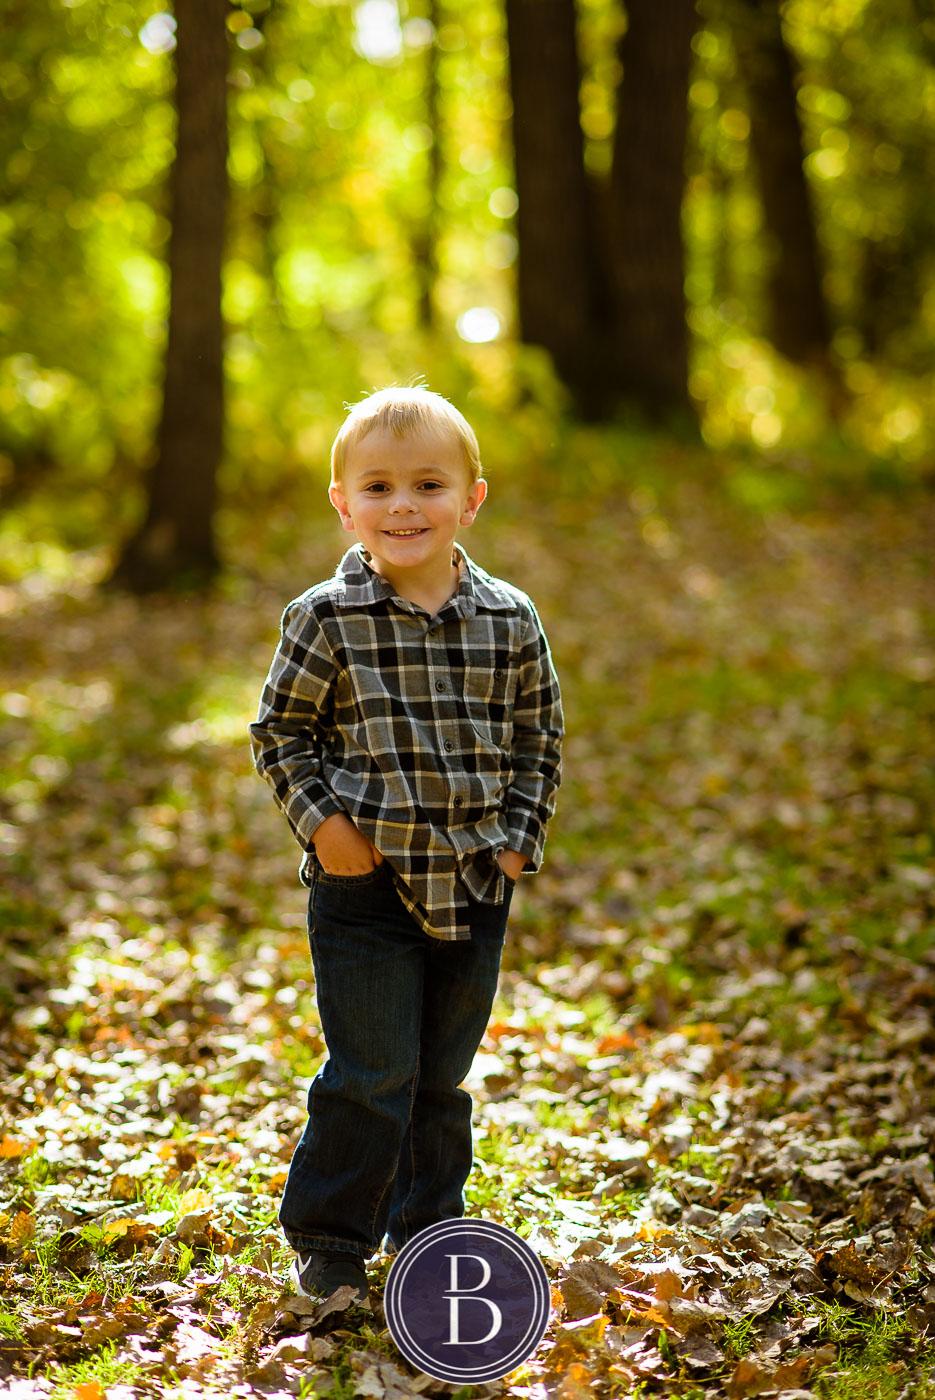 family fall photo portrait boy